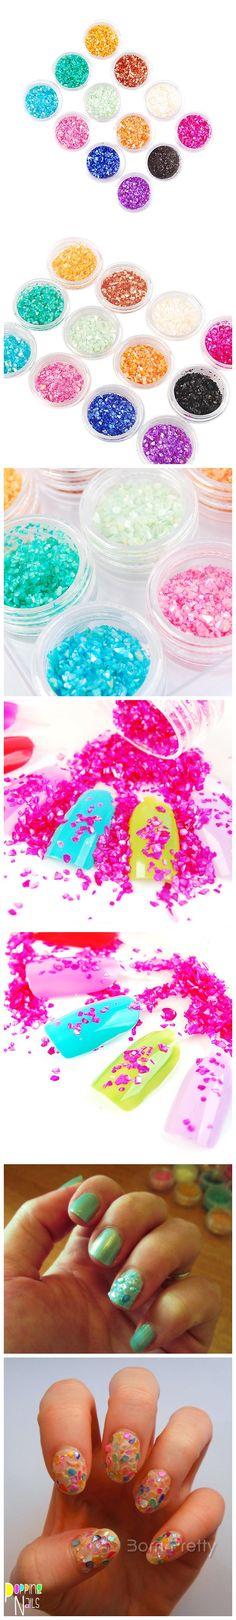 $5.38 12 Colors Crushed Shell Powder Nail Art UV Gel Acrylic - BornPrettyStore.com